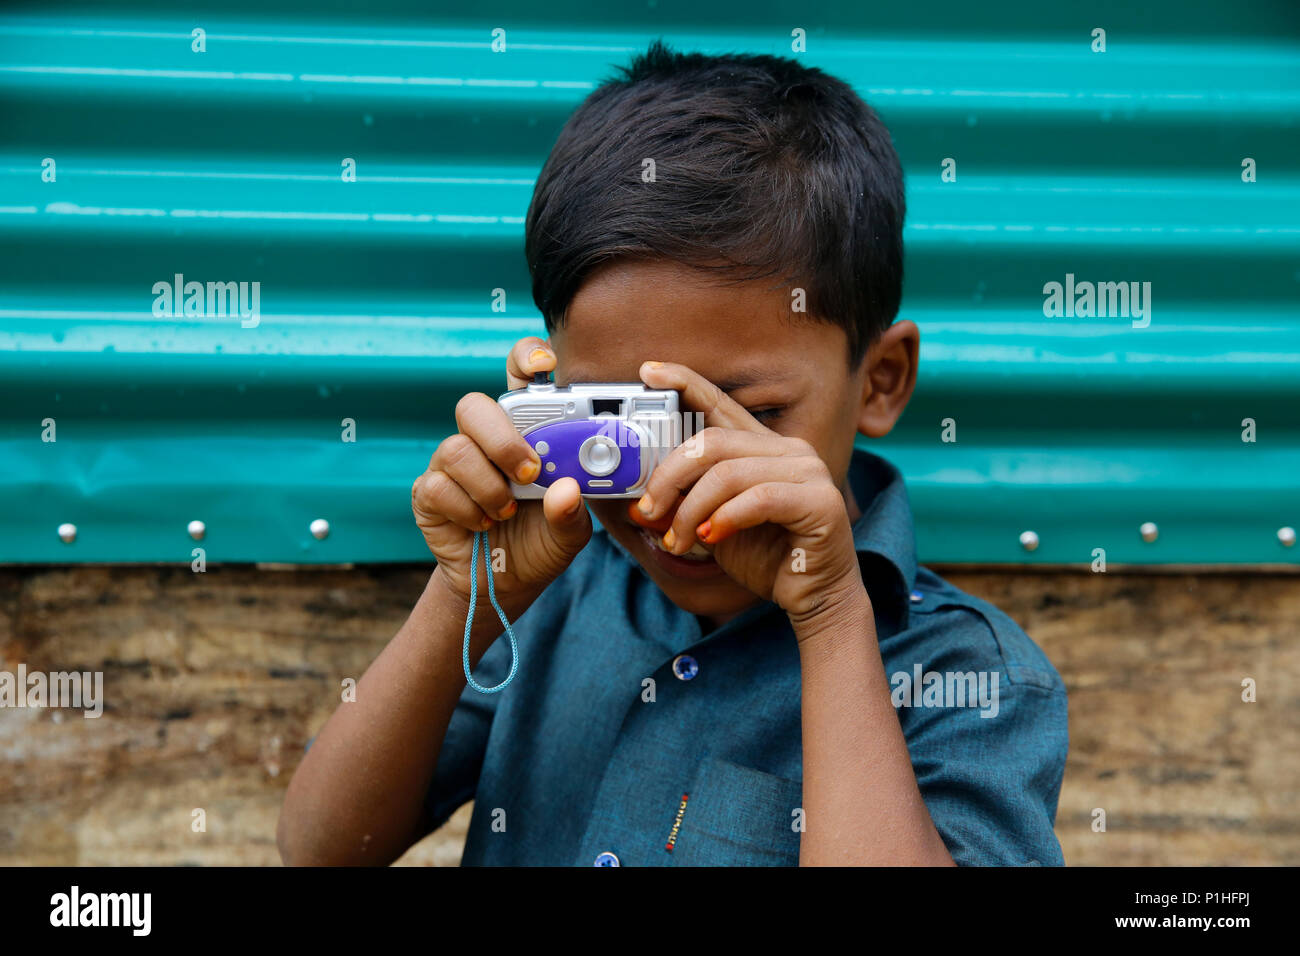 A Rohingya refugee boy with his toy camera at Kutupalong refugee camp at Ukhiya in Cox's Bazar, Bangladesh - Stock Image